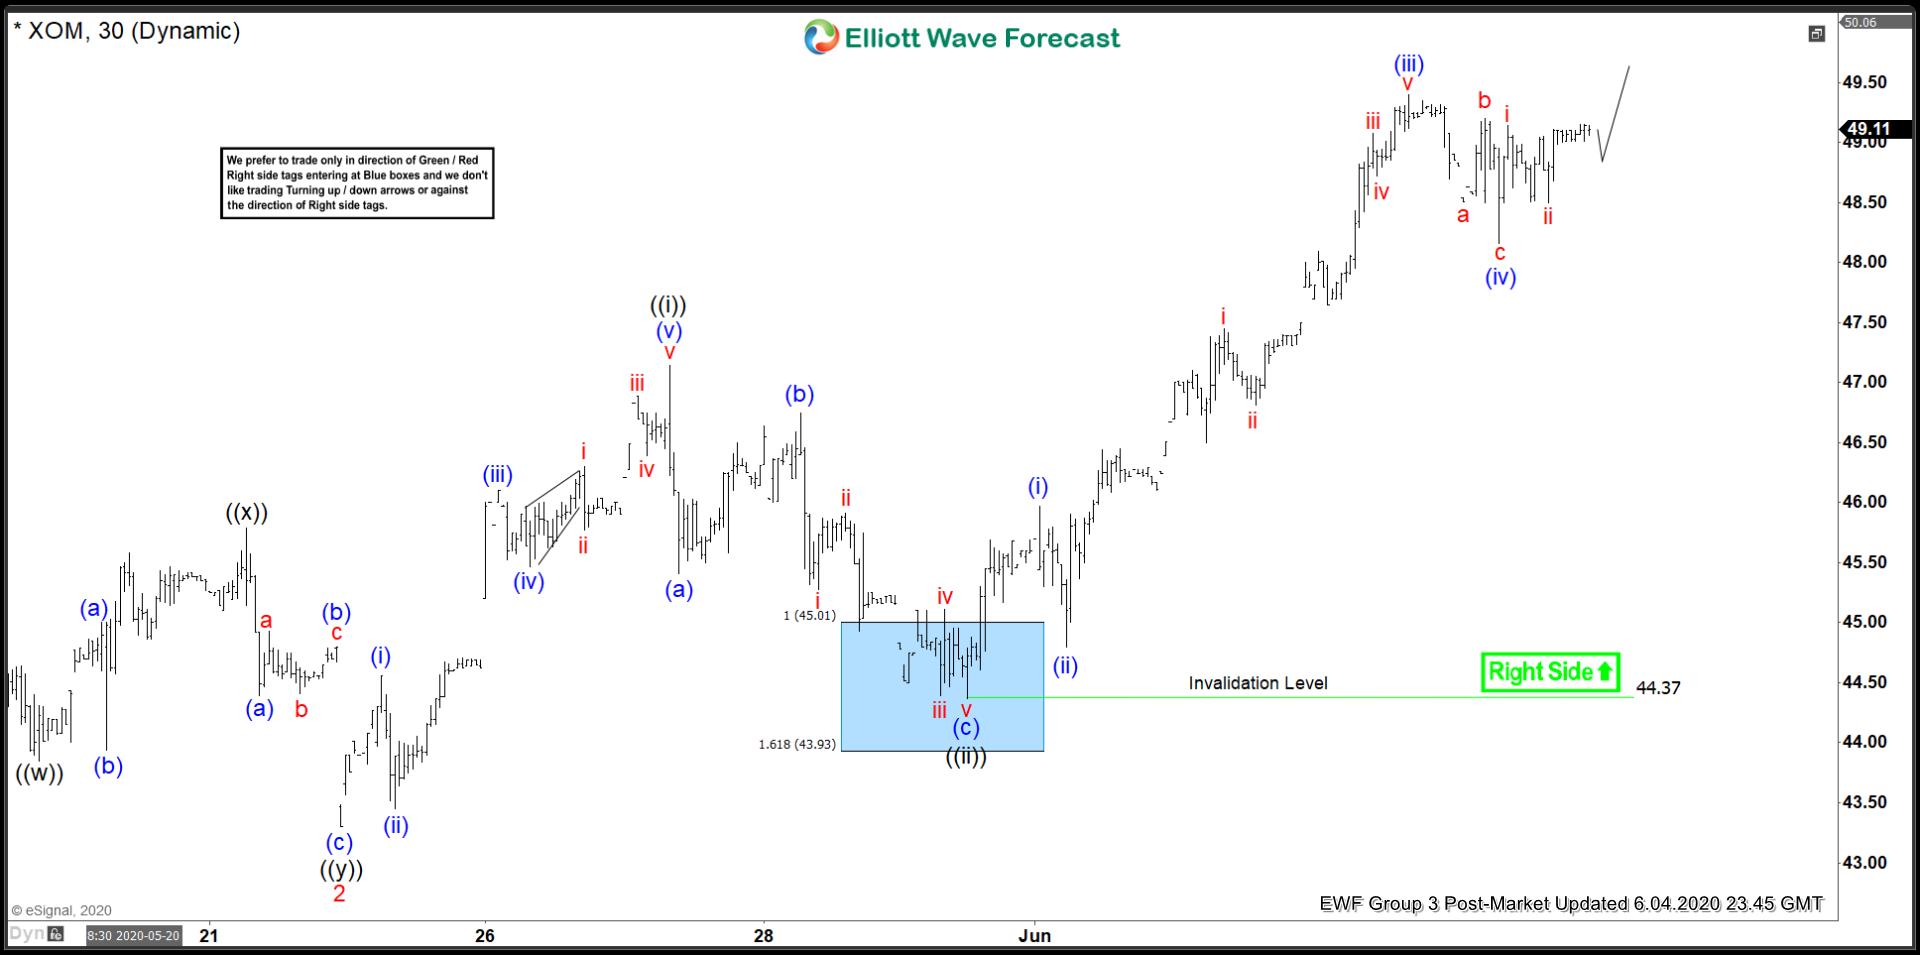 XOM Elliott Wave Chart 5 June